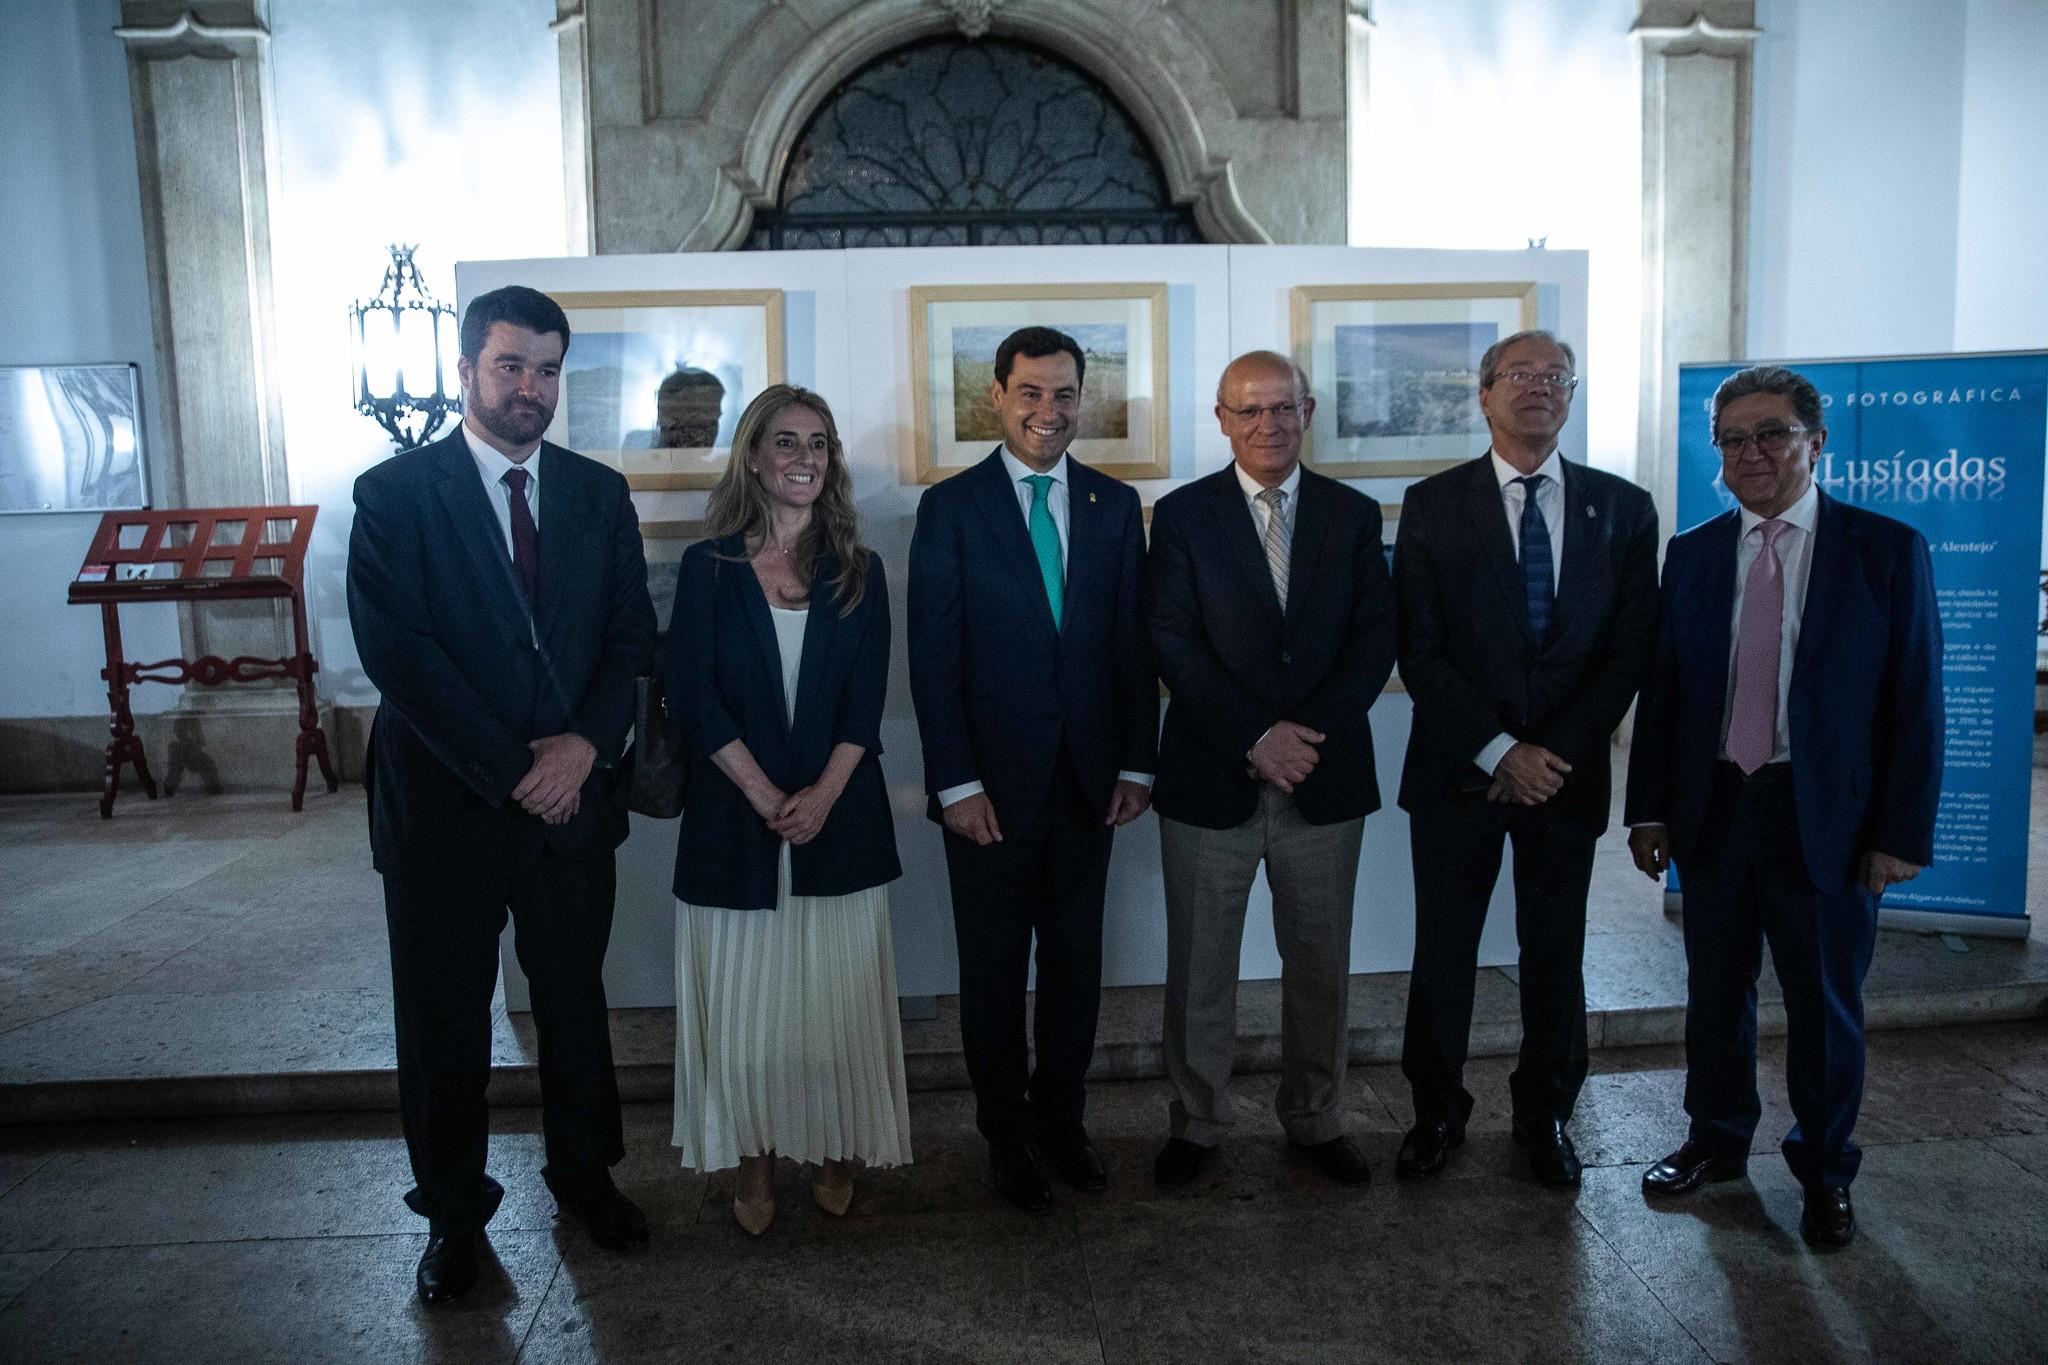 2019-05-30- Junta de Andalucía. Acto Consulado Portugal